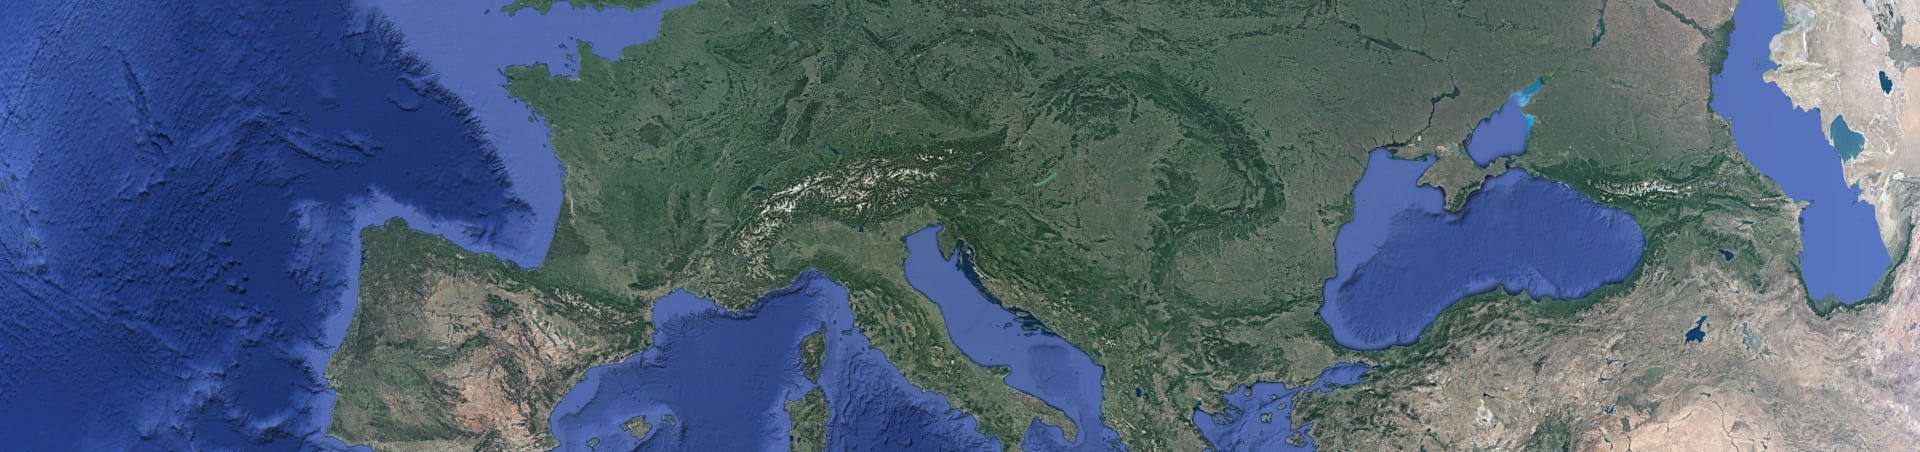 Europa aus dem All